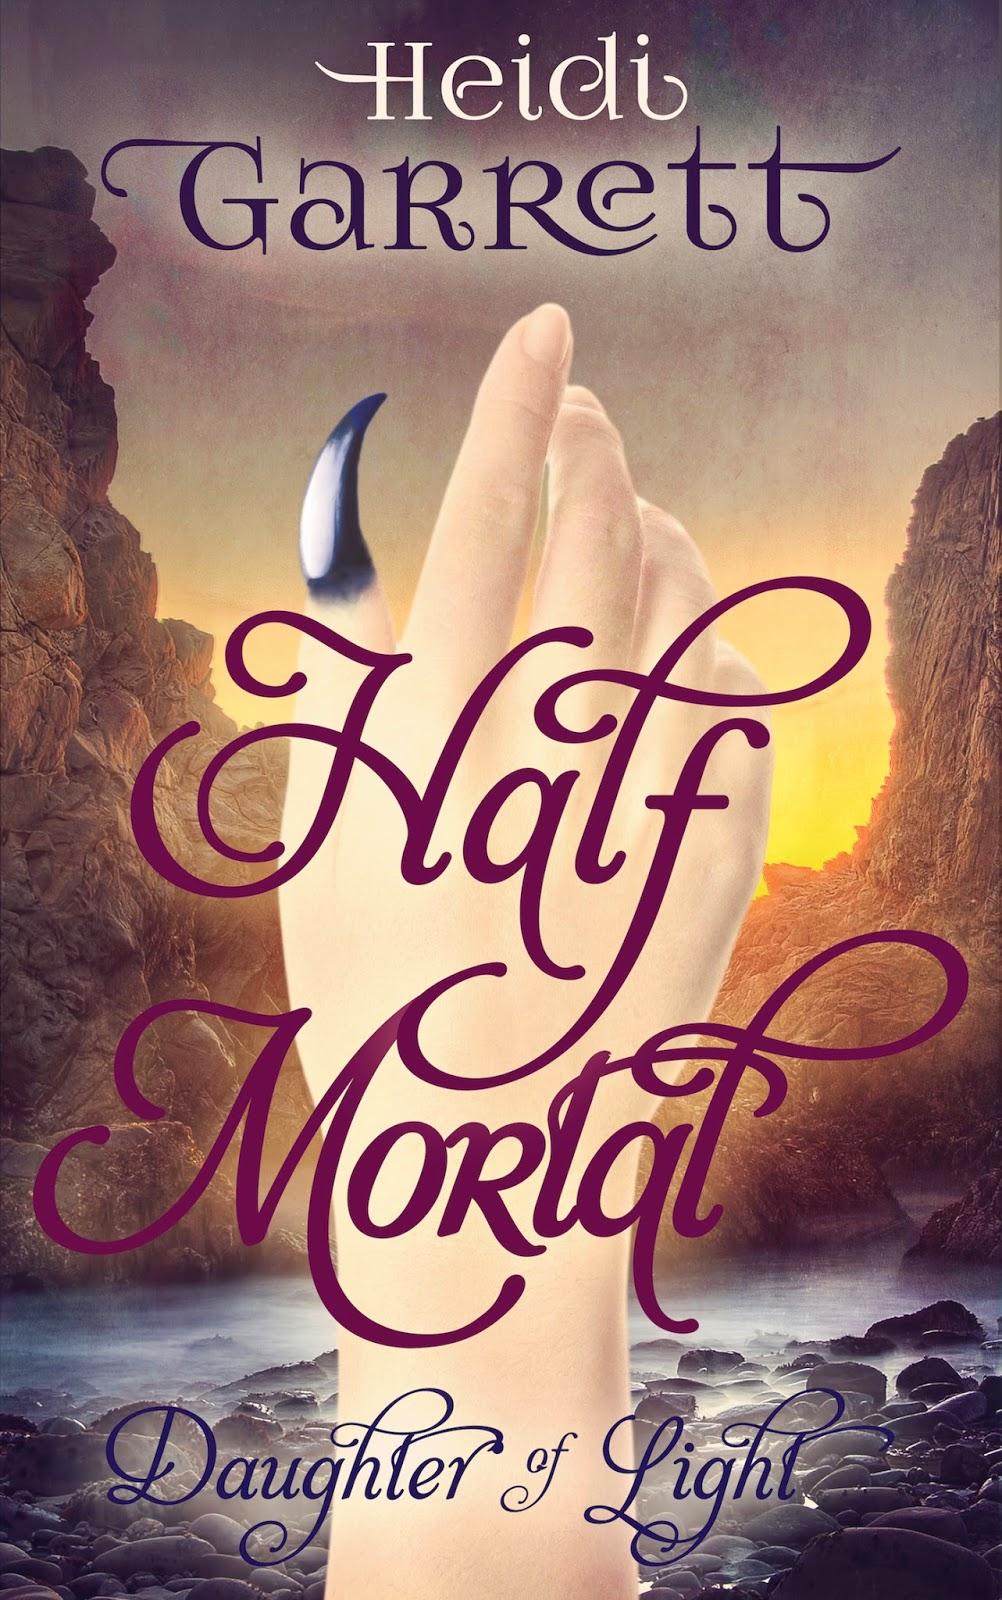 Half Mortal;